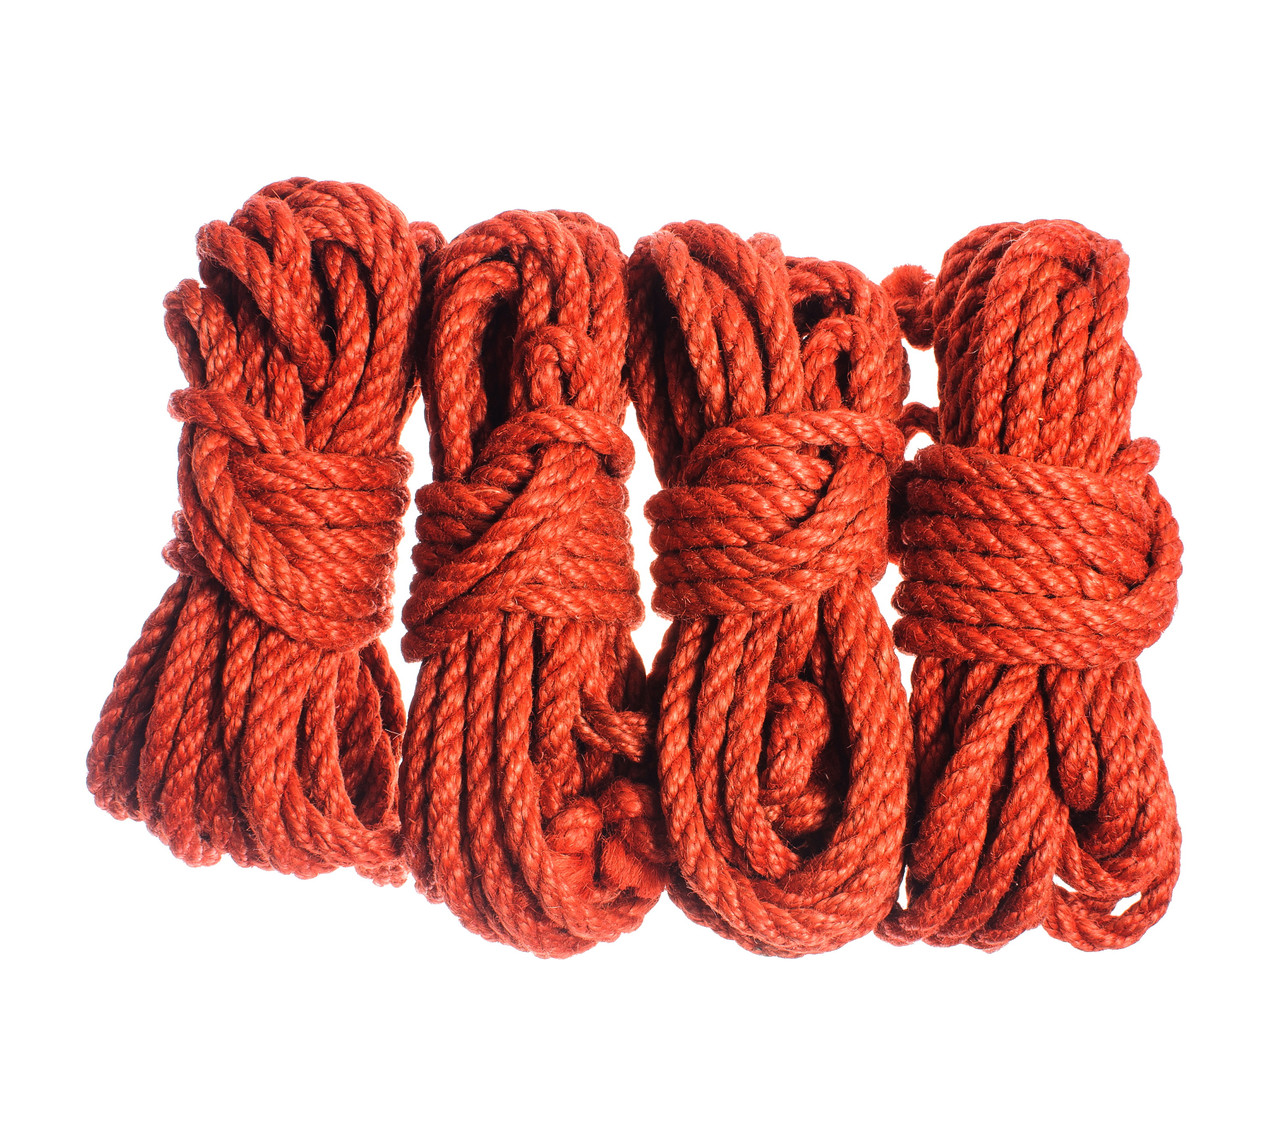 Набор веревок для шибари 4х8м. 8мм, БДСМ наборы, джут.красная